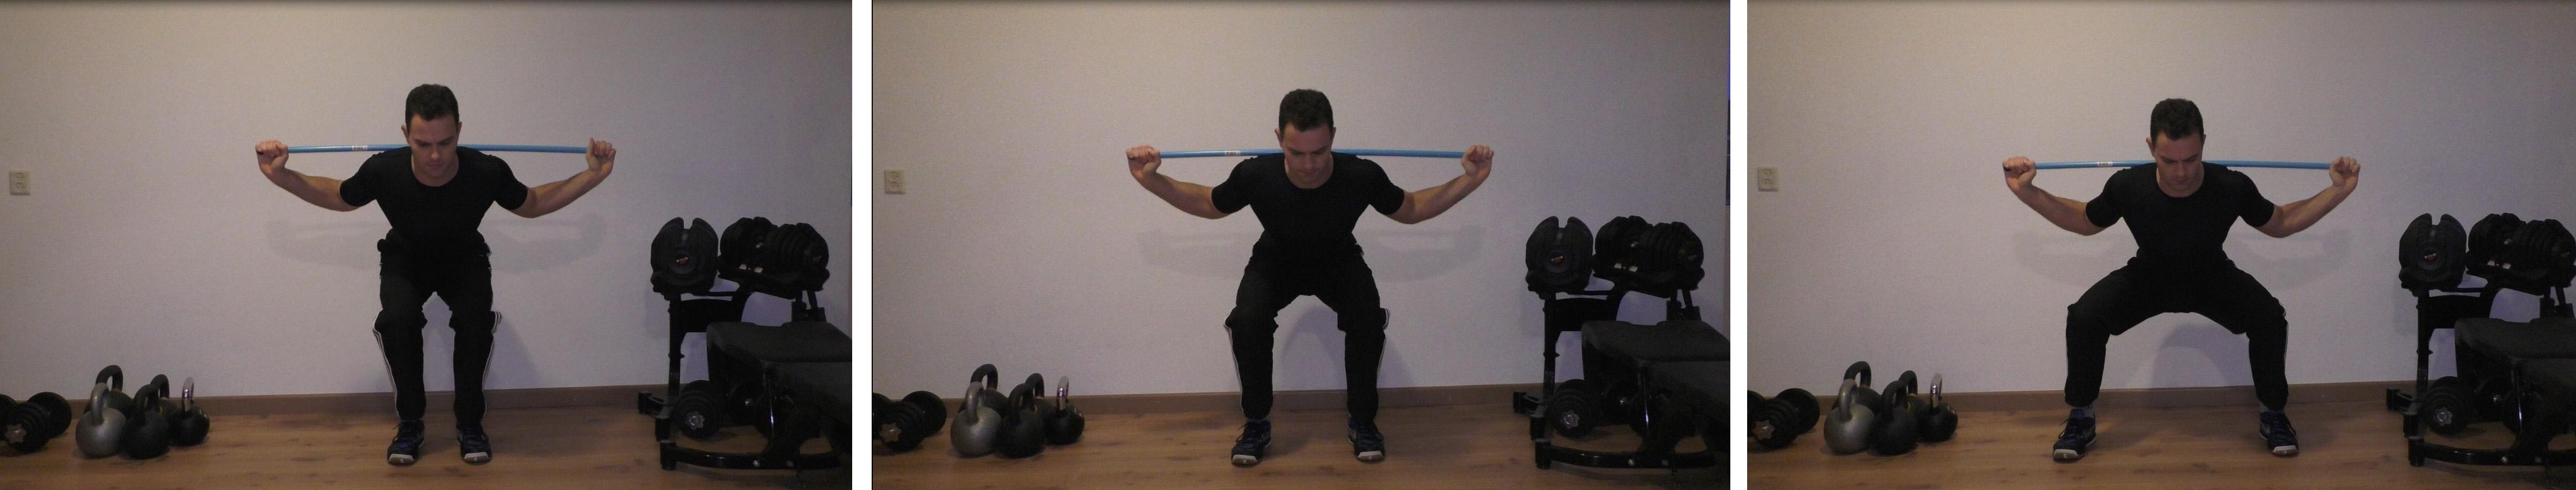 Voetbreedte squats